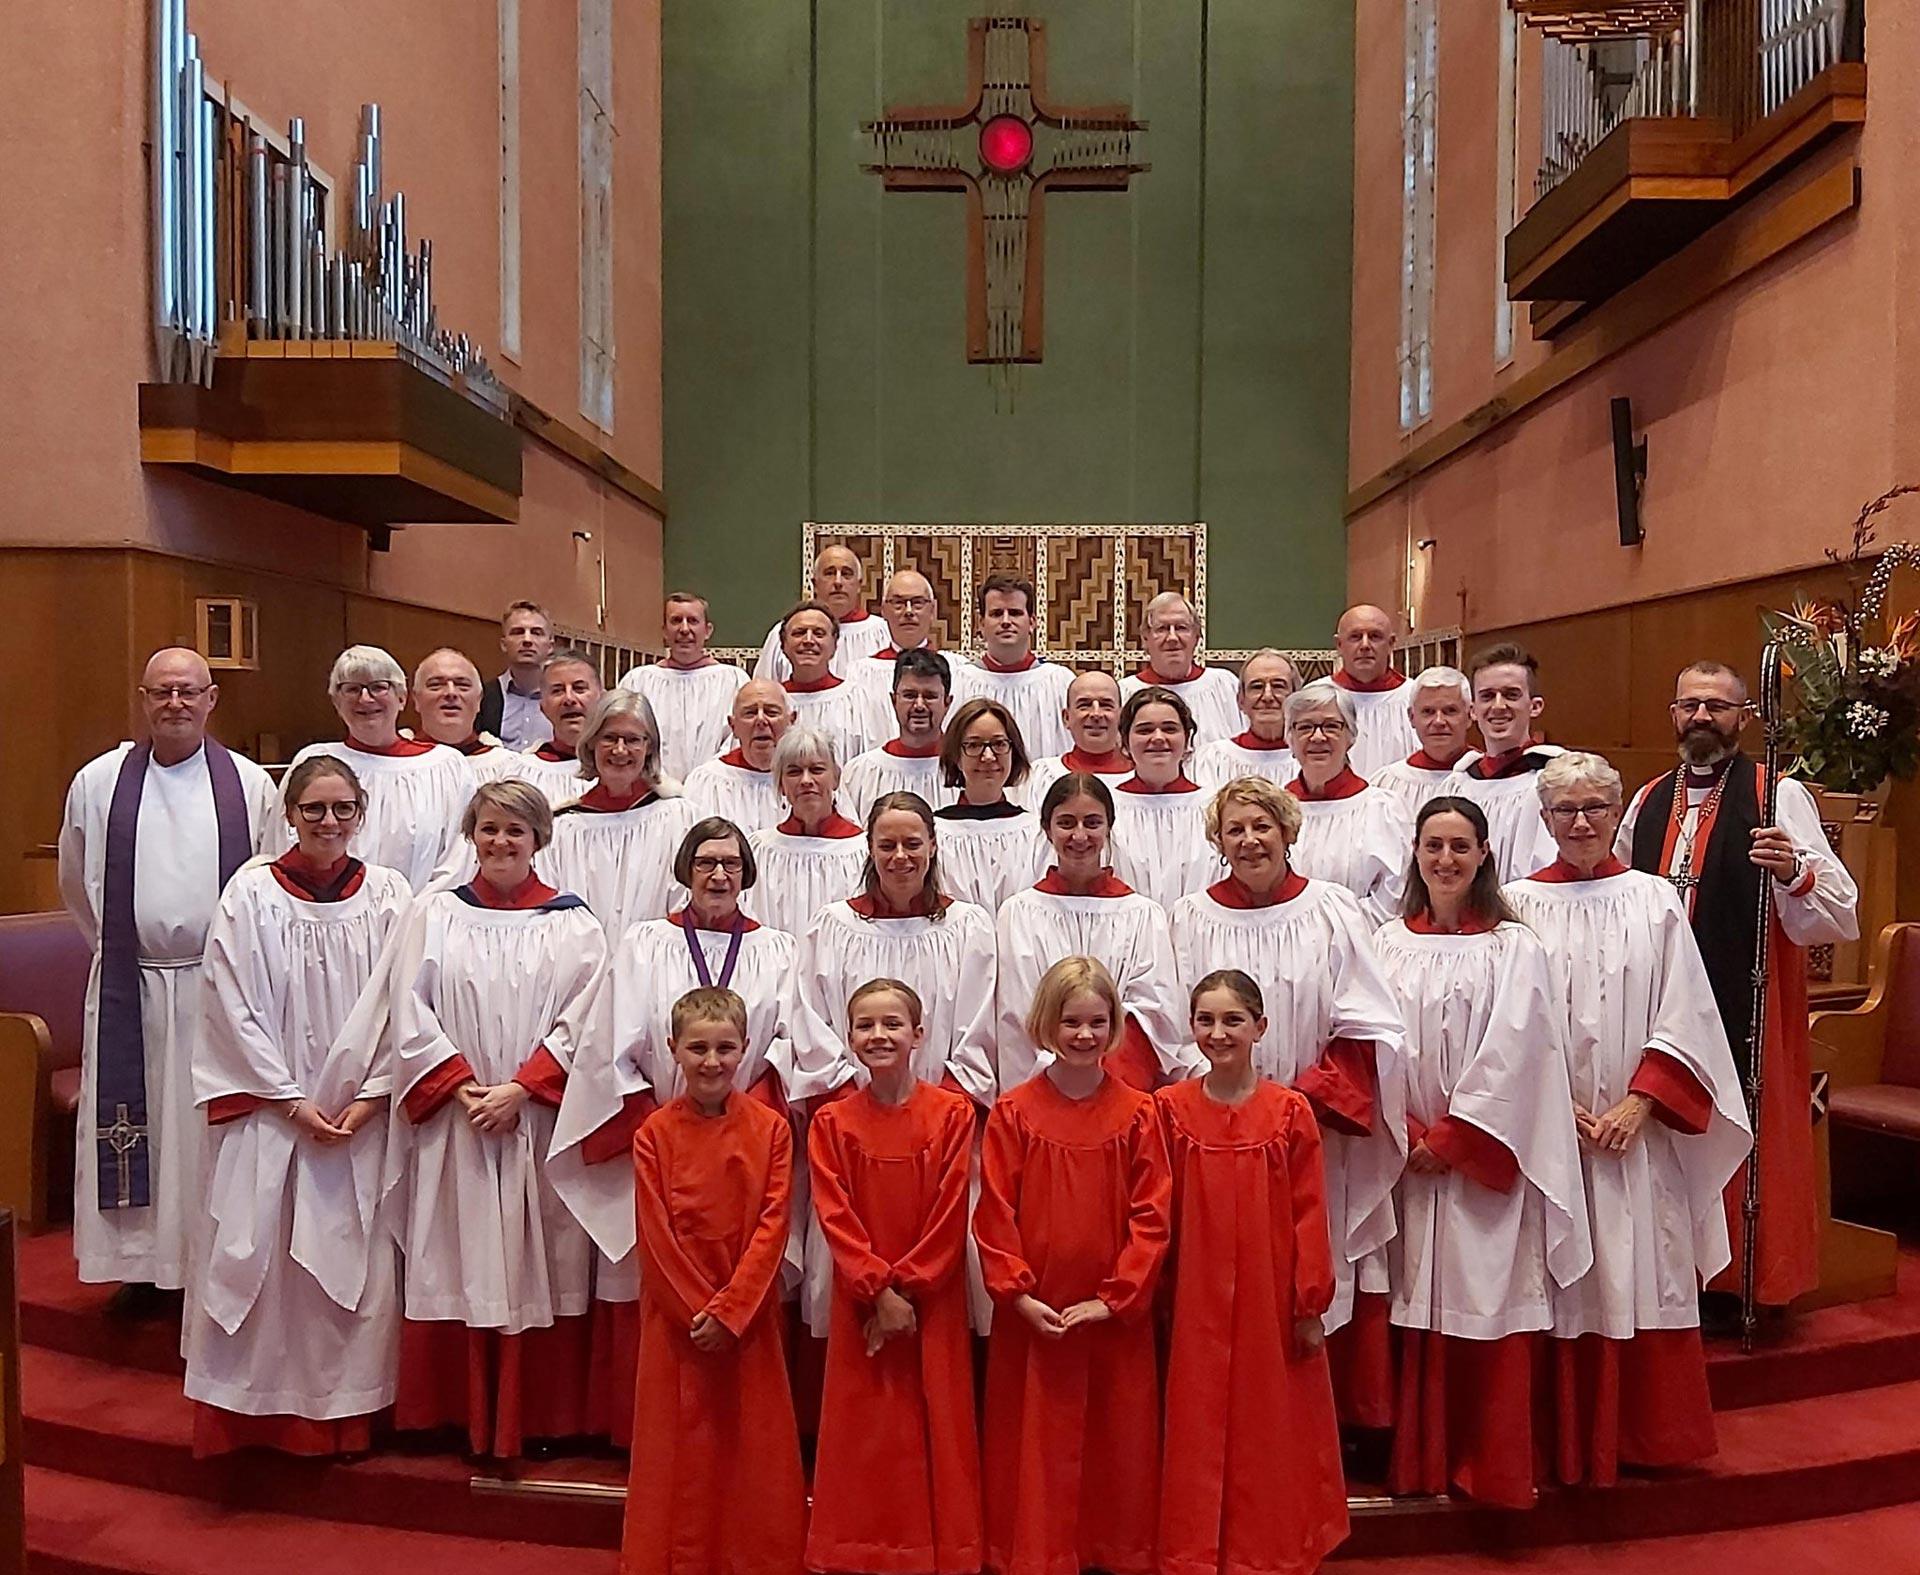 Waiapu Anglican Cathedral Choir